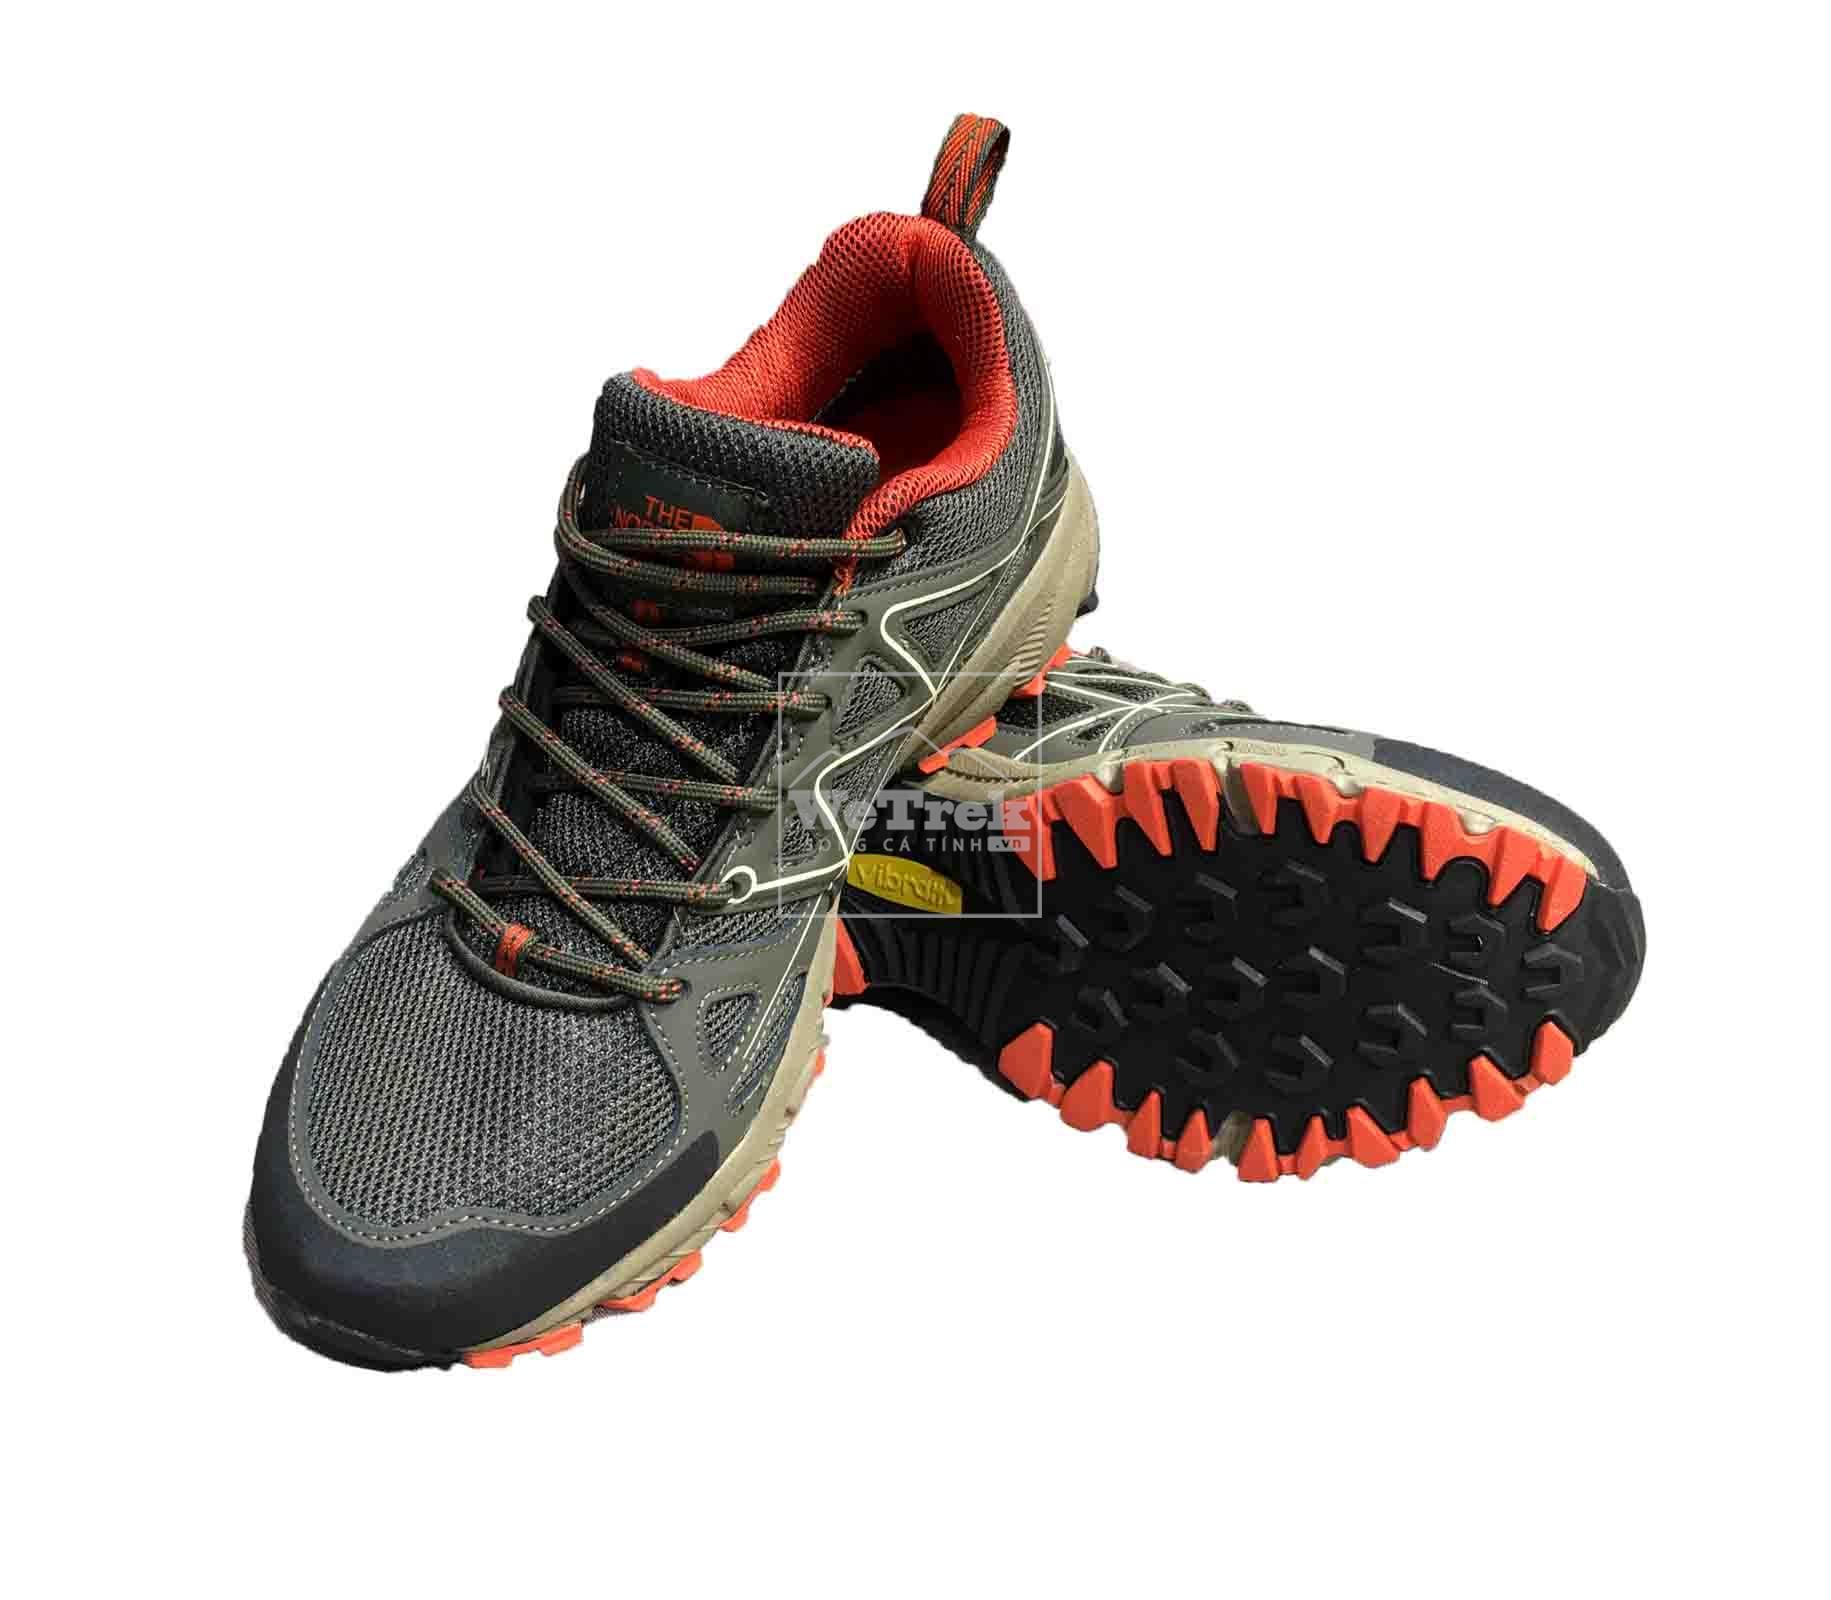 Giày leo núi cổ thấp VNXK TNF - 8853